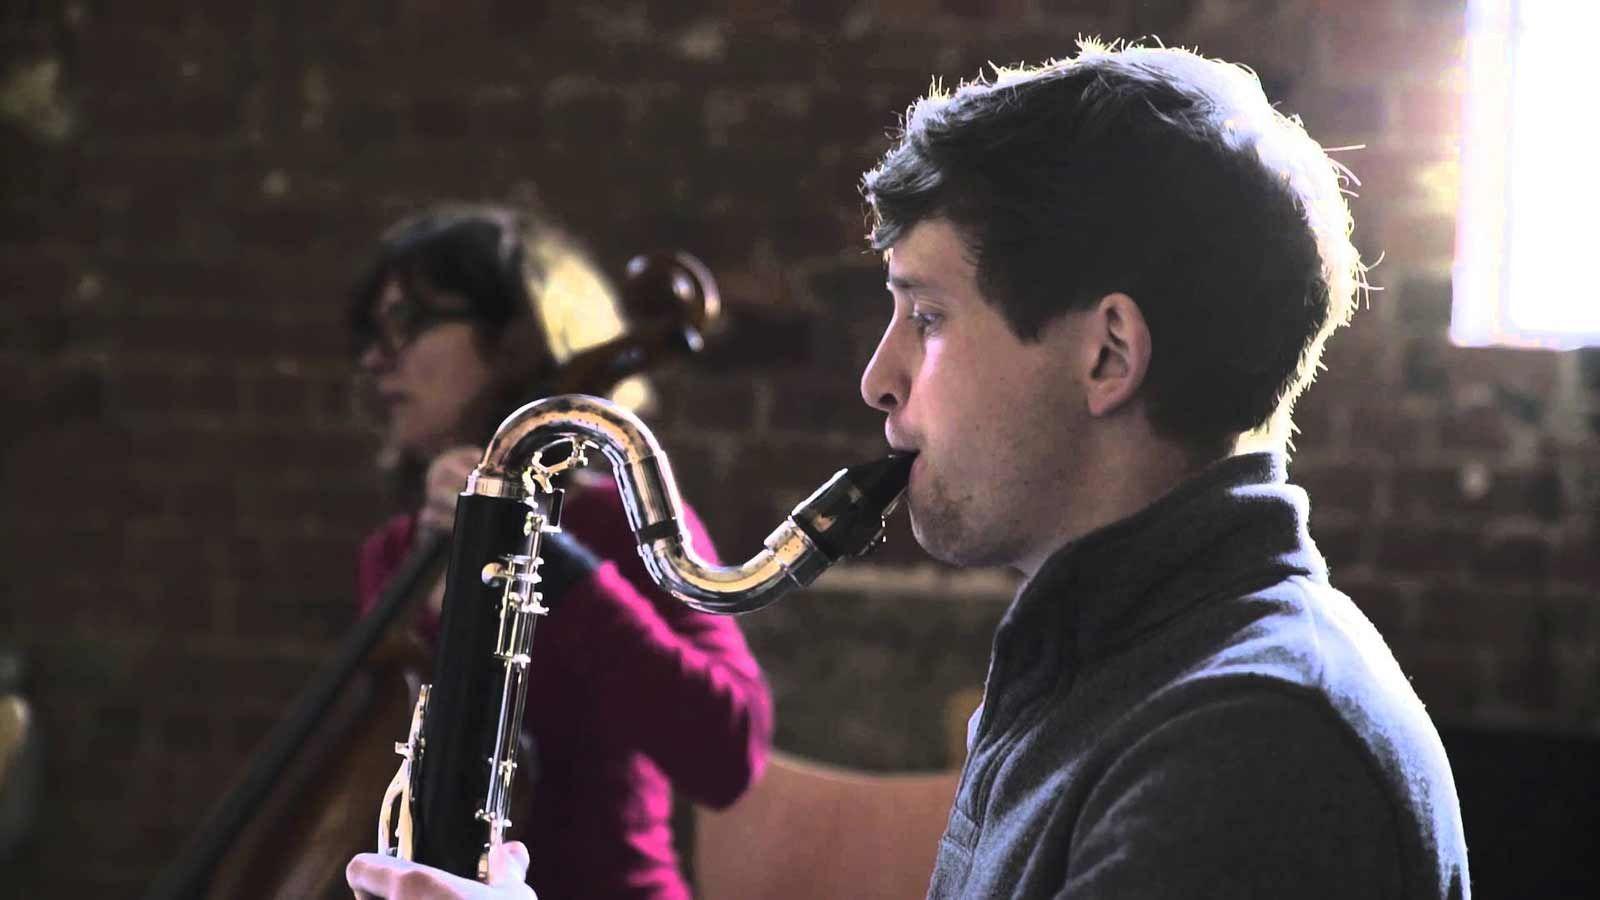 Immix Ensemble, a saxophone player from Australia, pairs